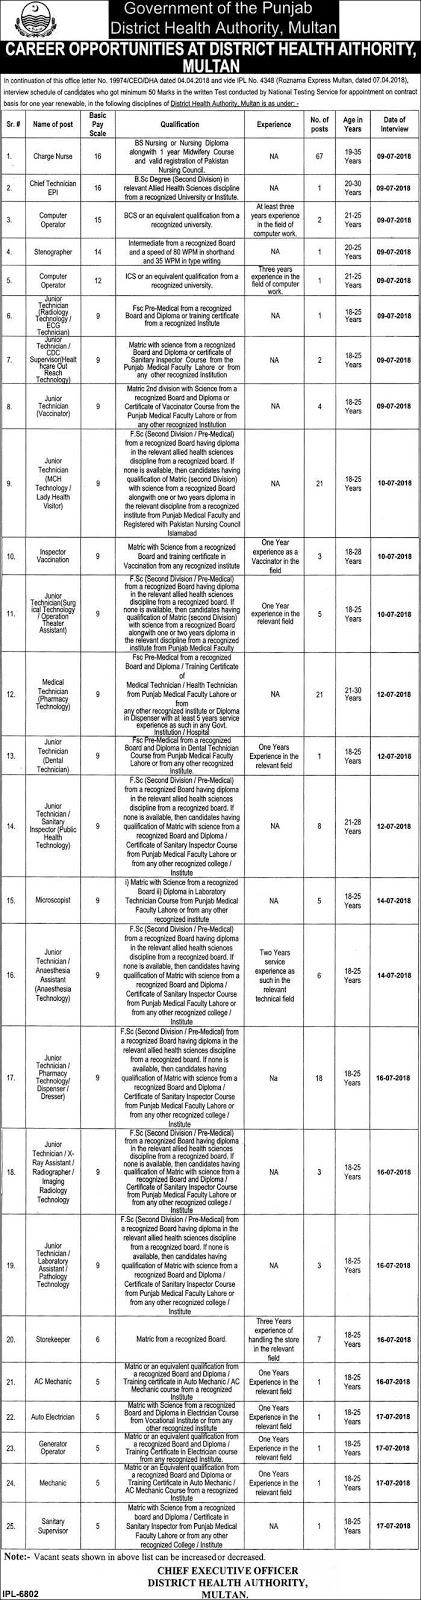 Multan under Health Department